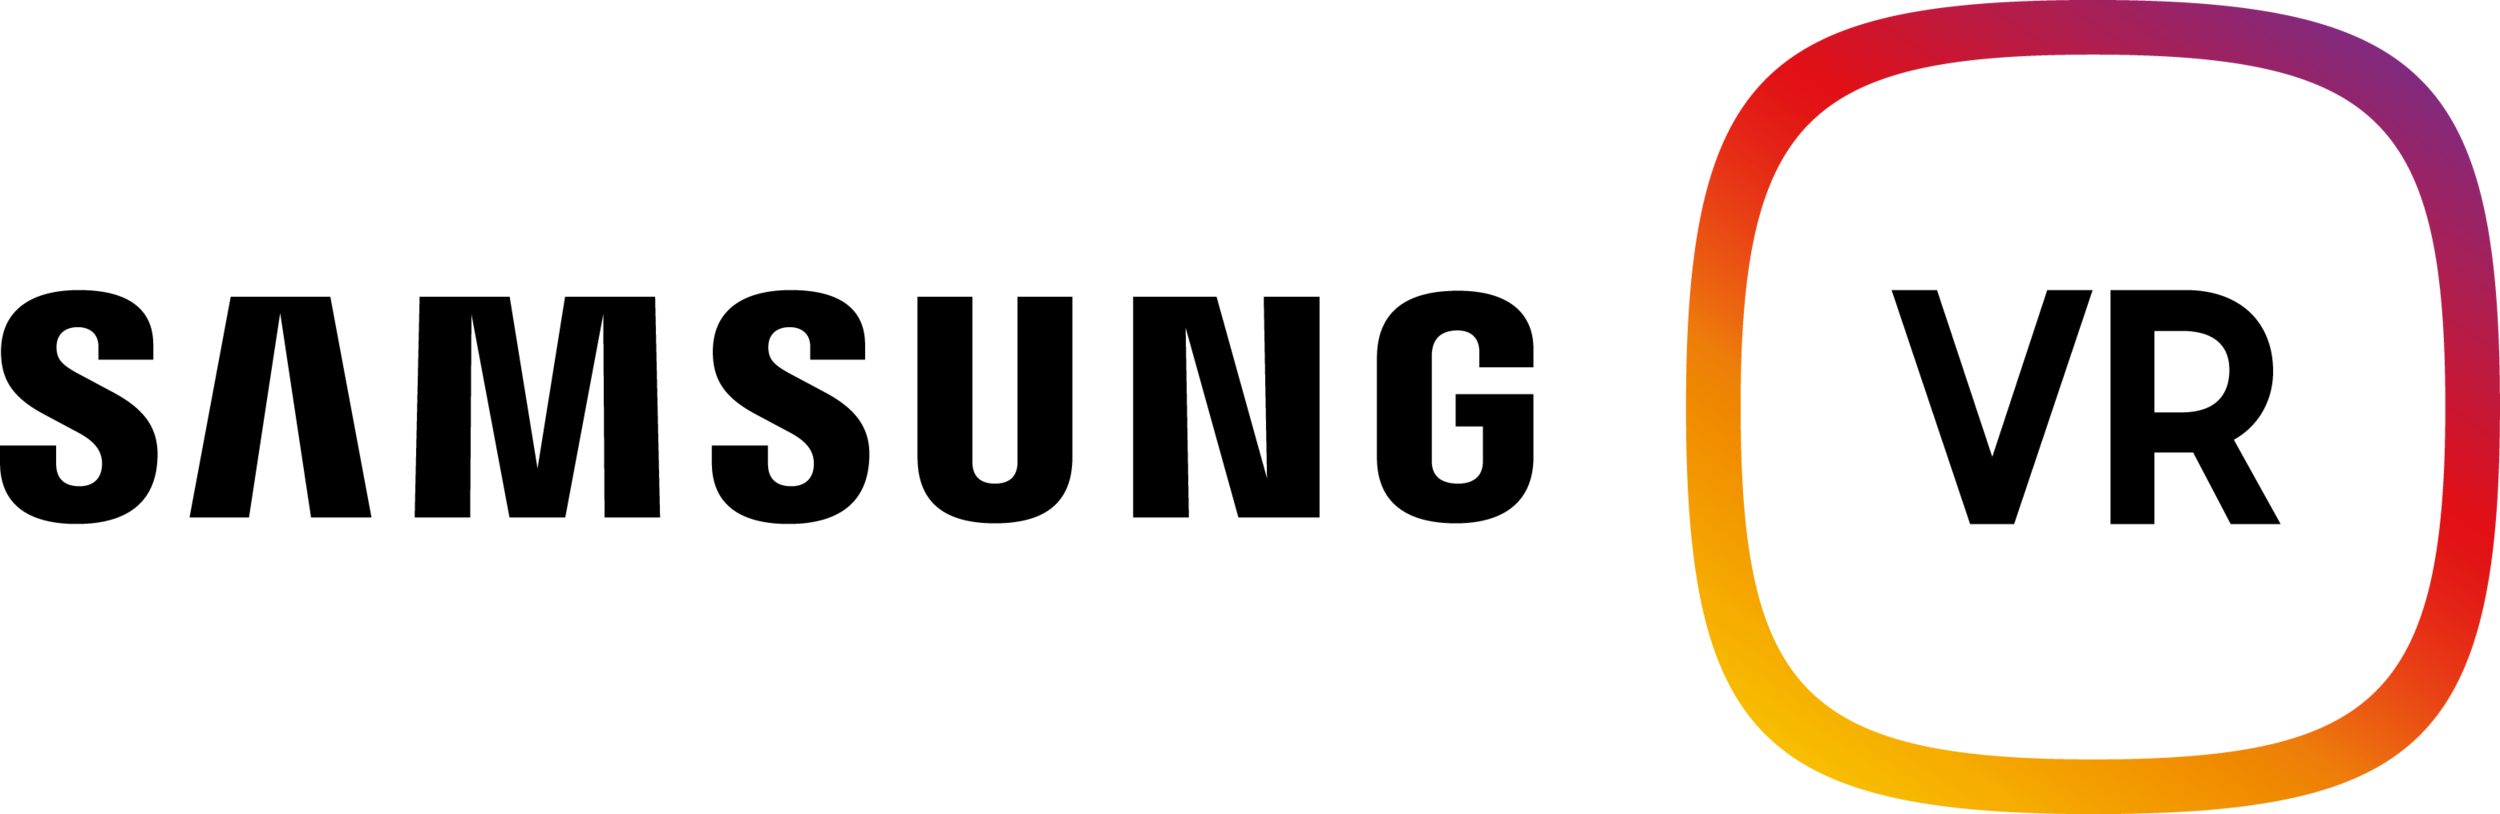 VR_APP_Lockup_RGB.png